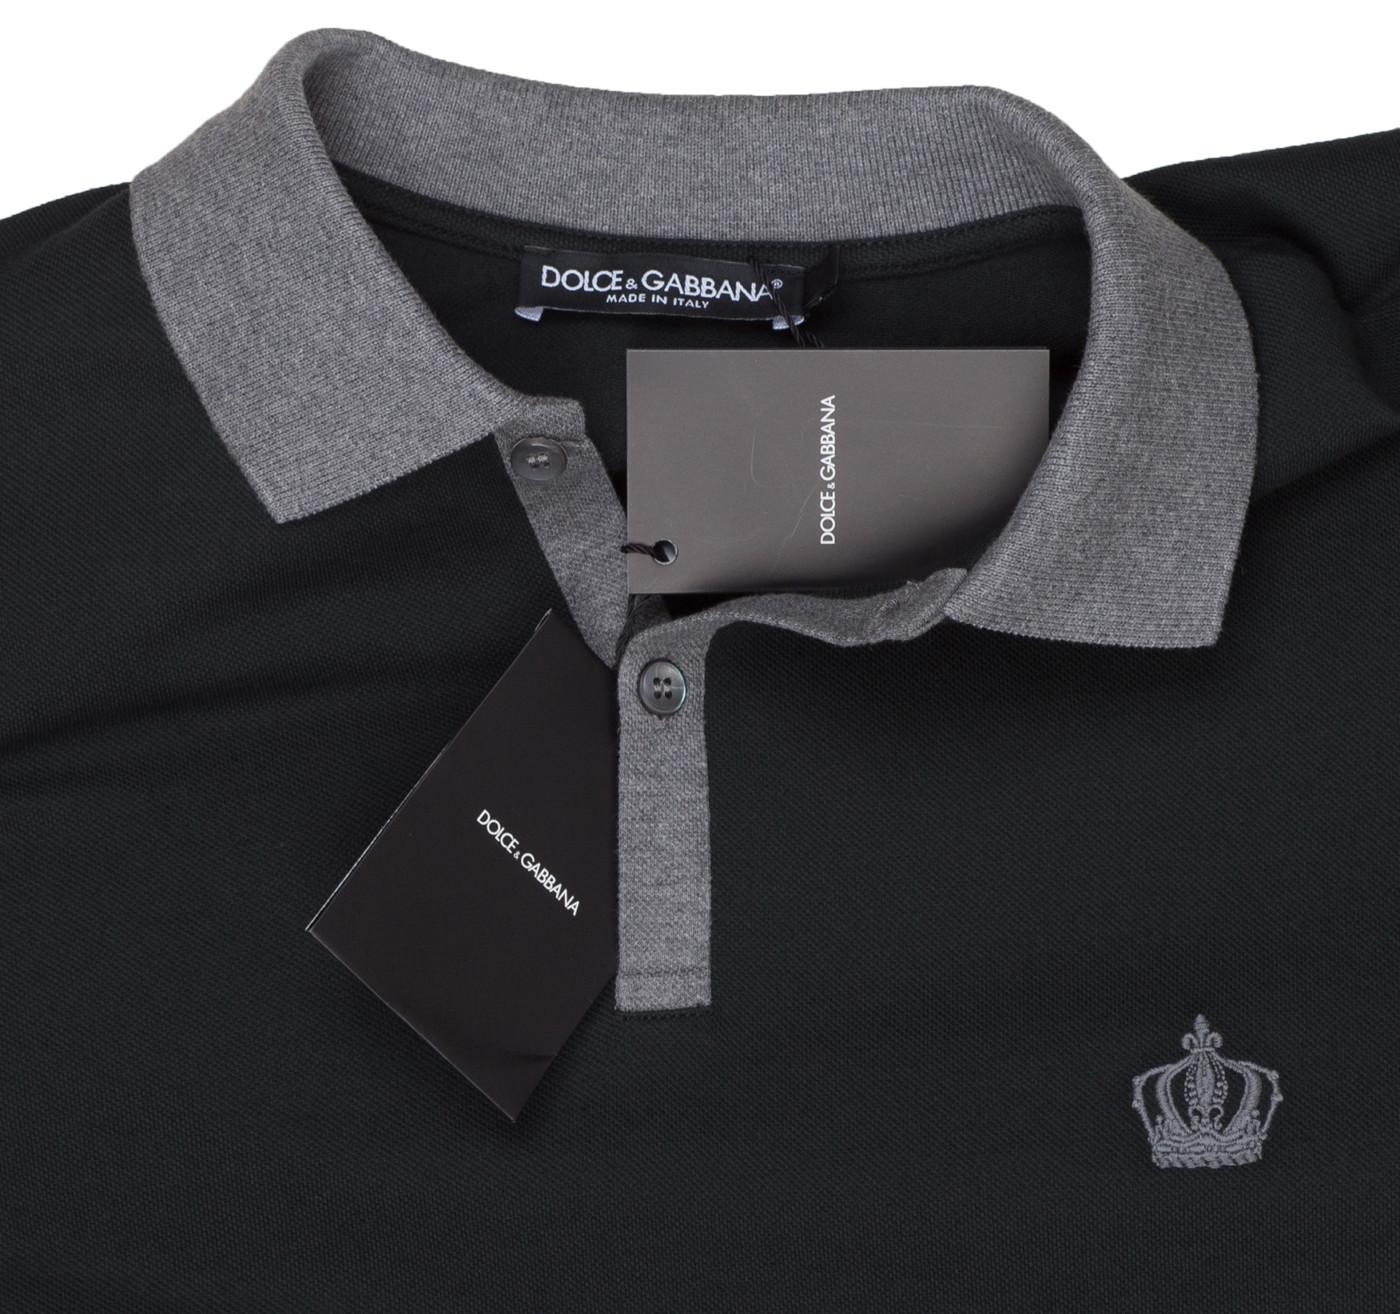 478eafff7 Dolce & Gabbana Men's Dark Green Crown 'Corona' Short Sleeve Contrast Polo  Shirt